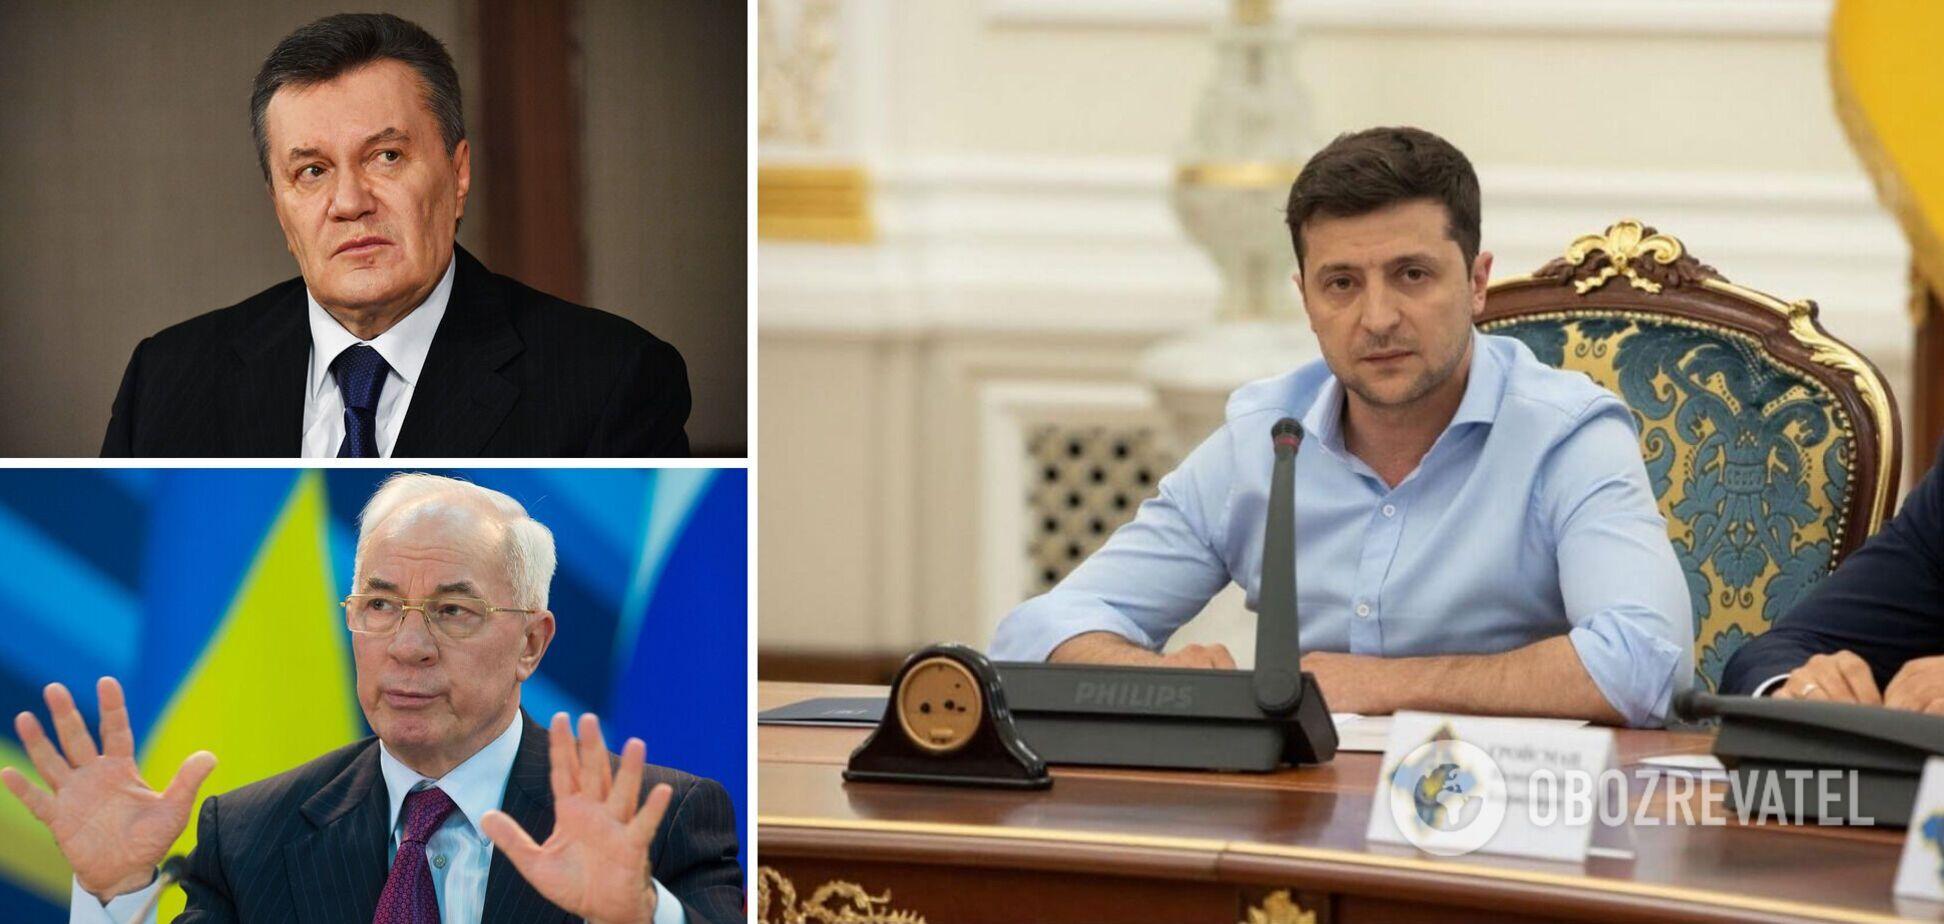 Зеленский подписал указ о санкциях СНБО